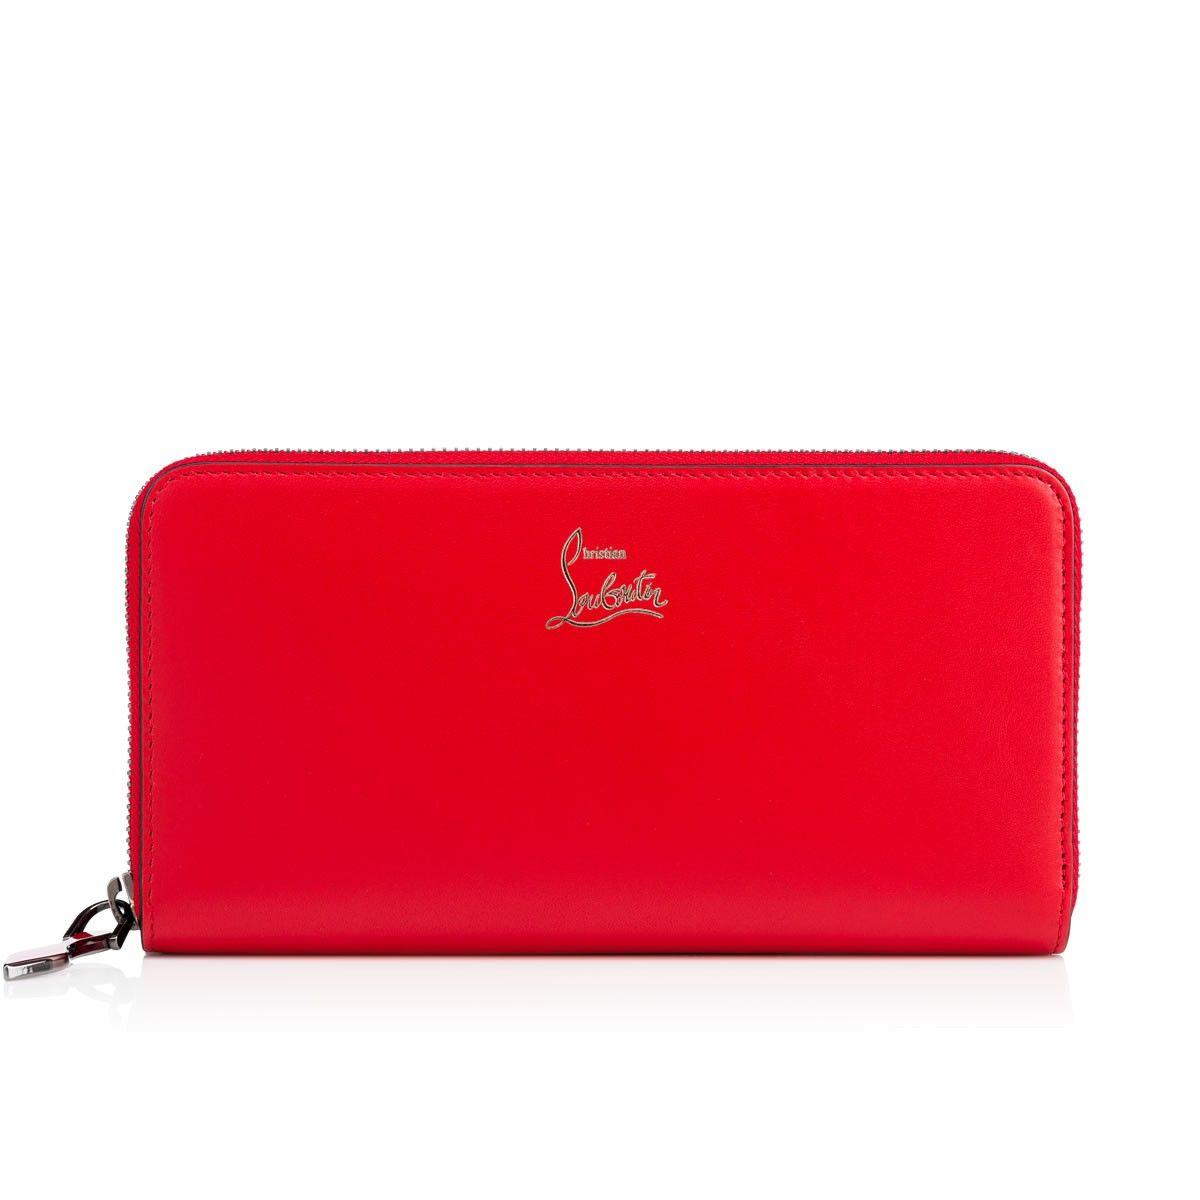 4cc87496002 Accessoires - Panettone Wallet - Christian Louboutin | Louboutin ...